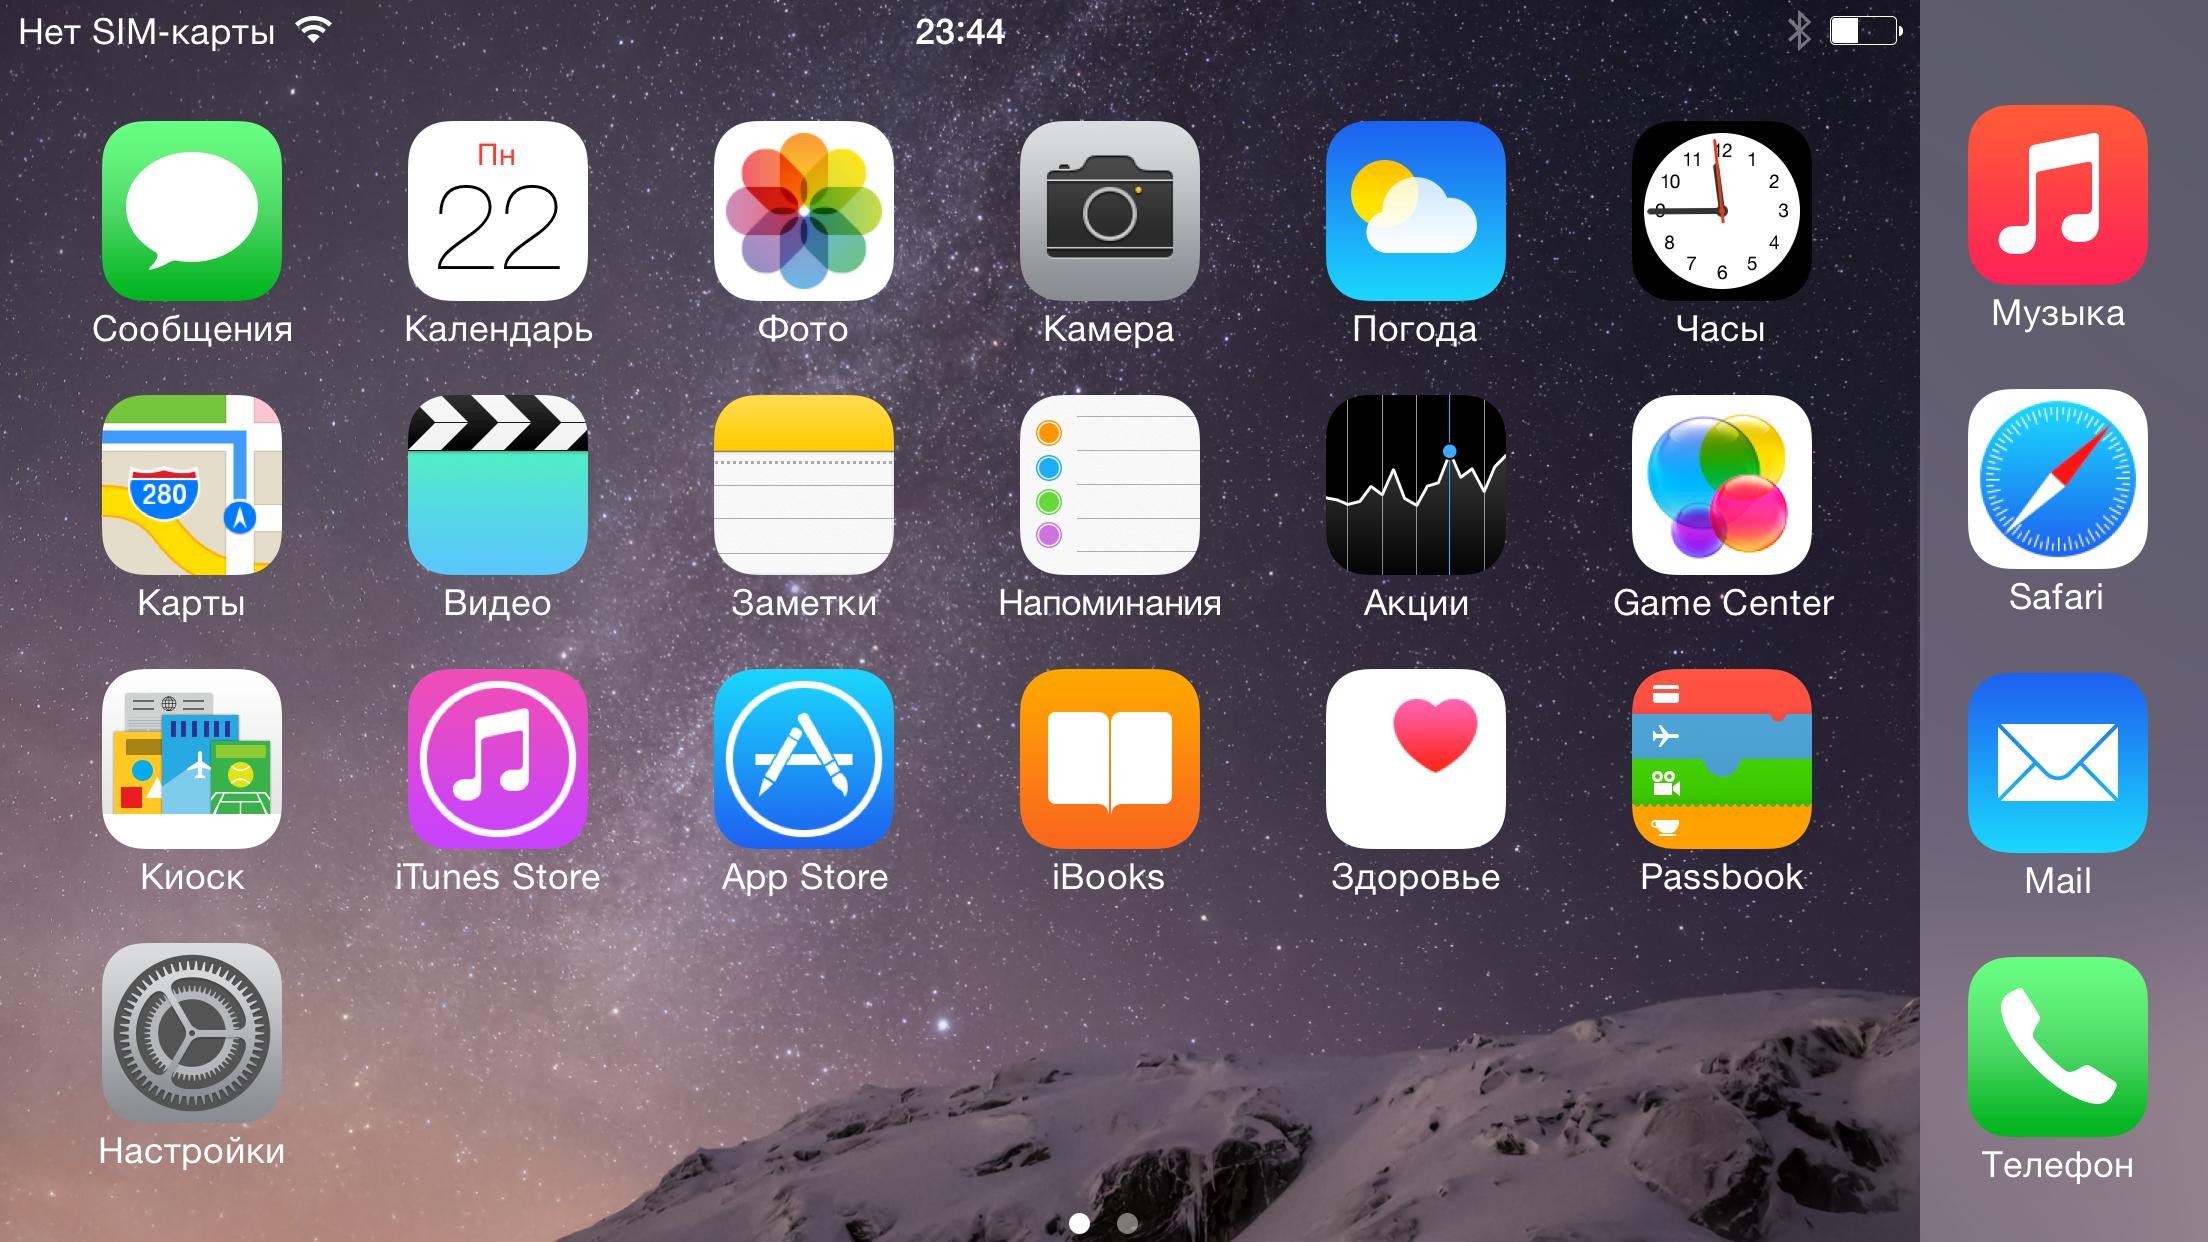 iphone6-plus-screenshot-1 10 особенностей iOS 8, которых не хватает Android